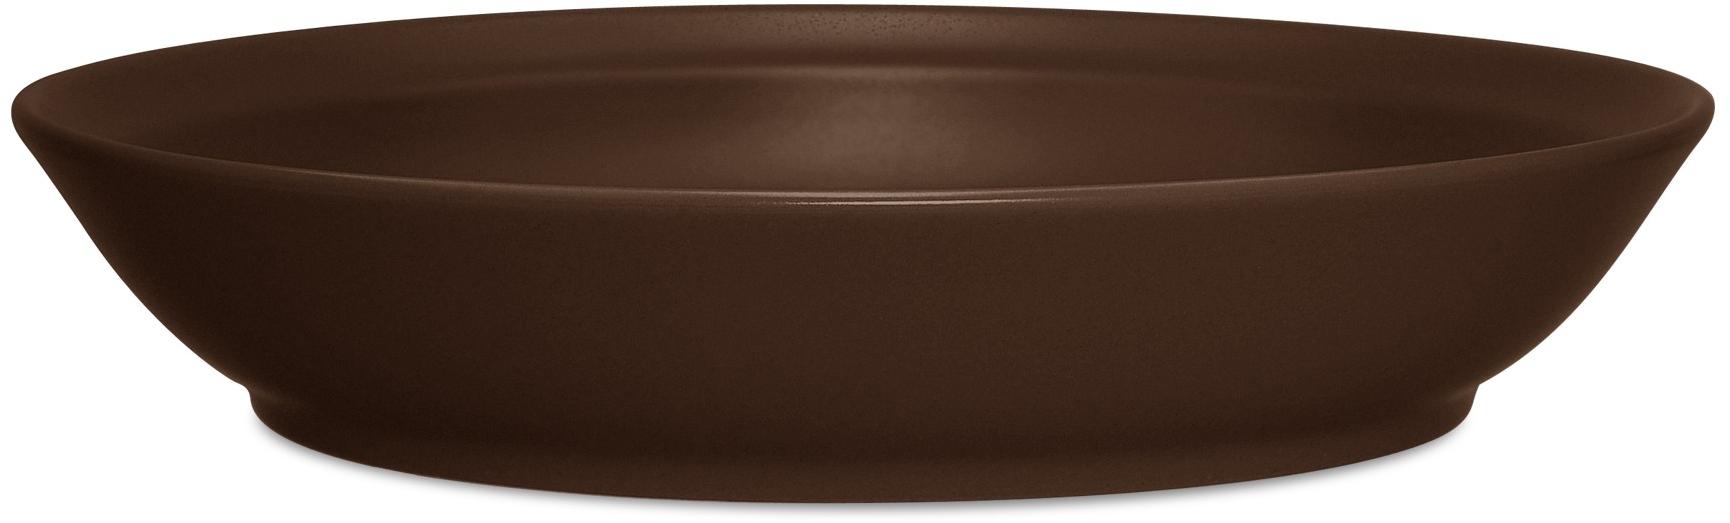 "Noritake Colorwave Chocolate Bakeware—Round Baker/Pie Plate, 9 1/2"""